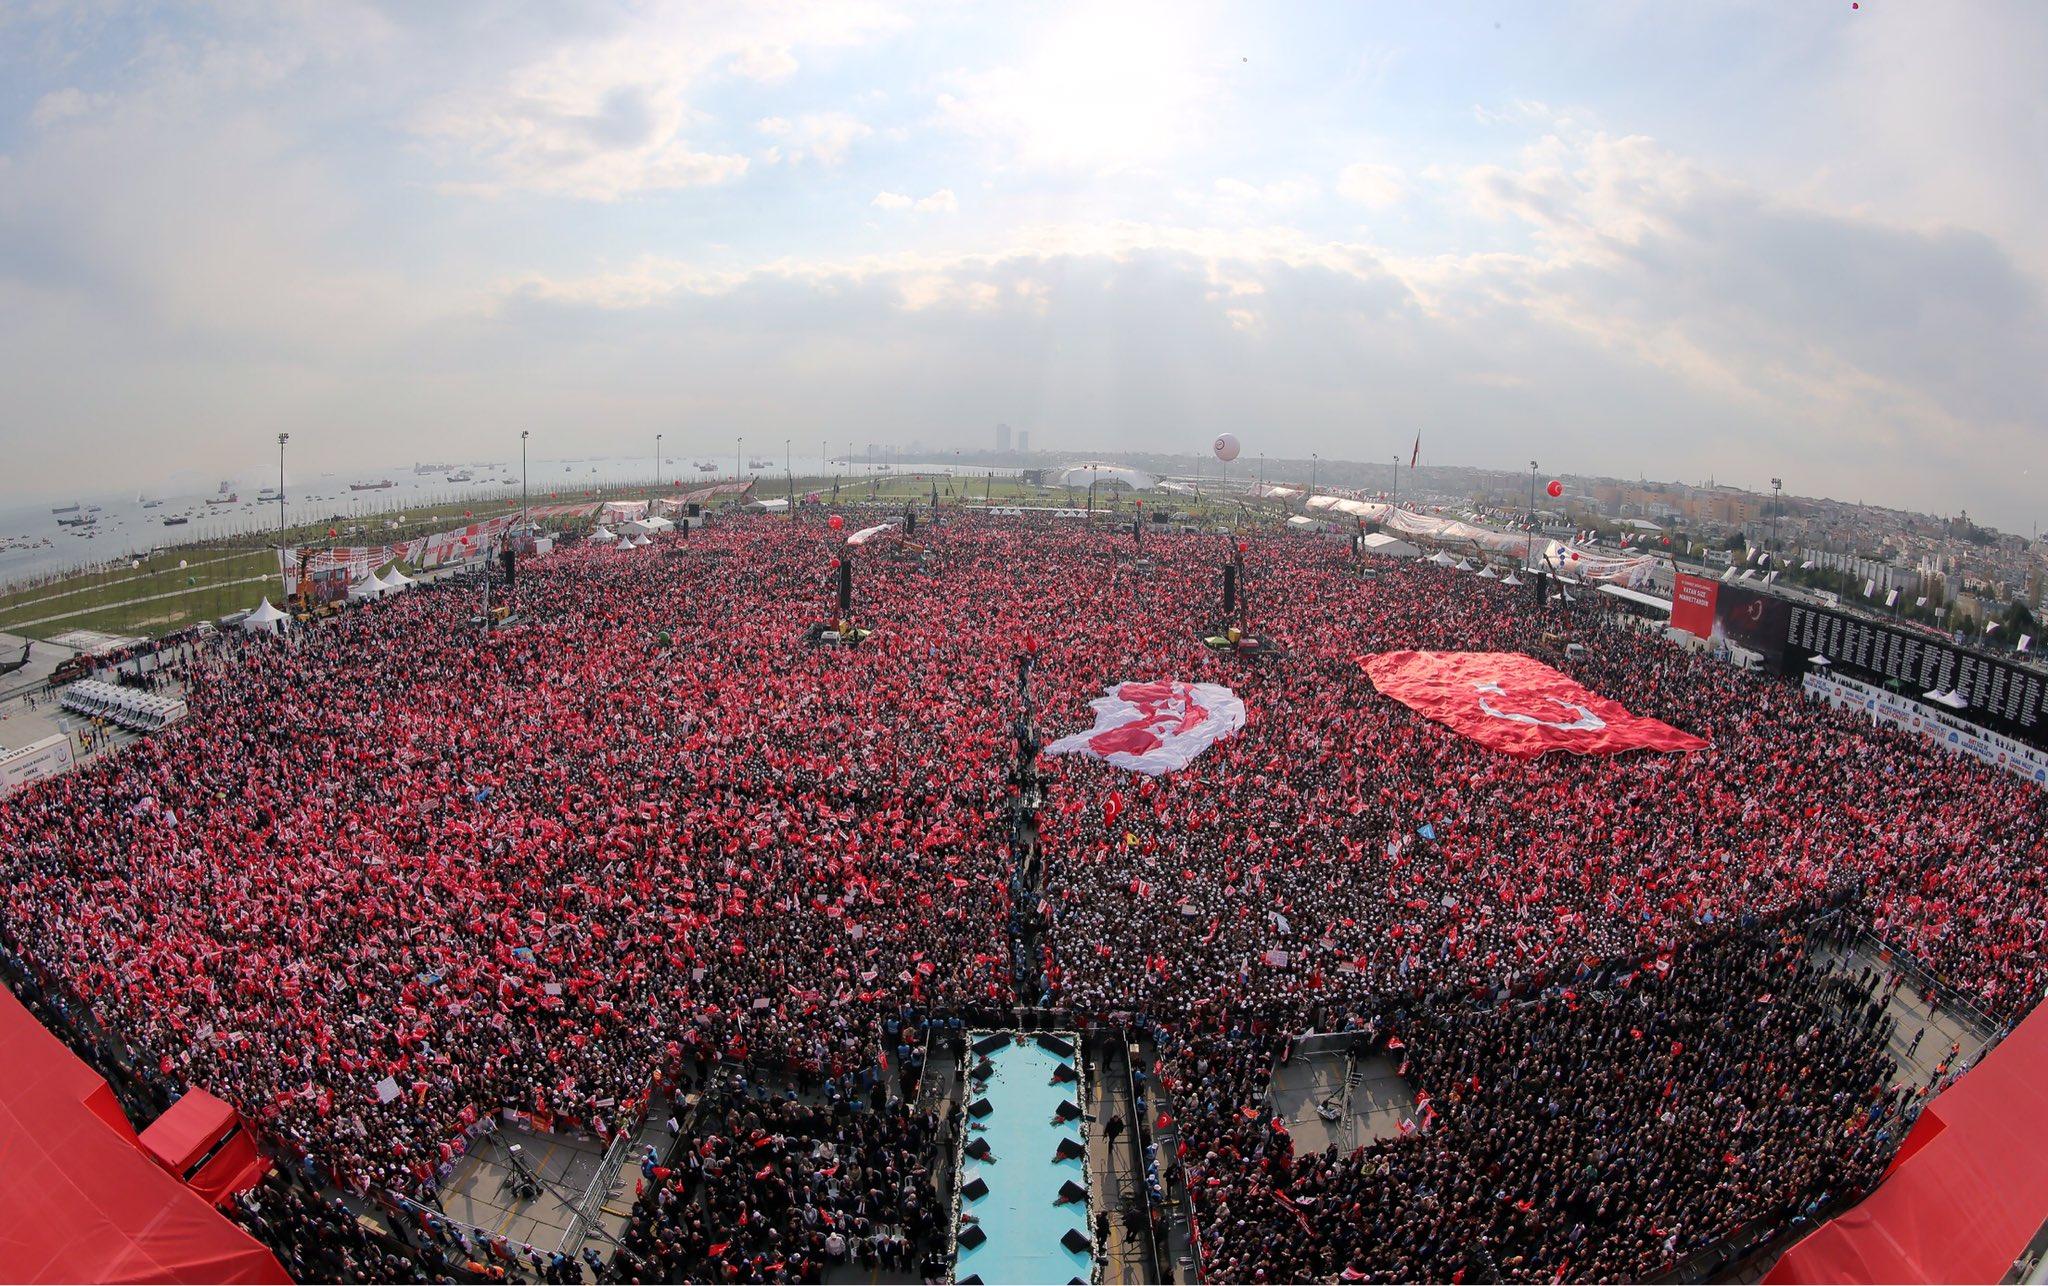 Teşekkürler İstanbul! https://t.co/J4BFHz66nI